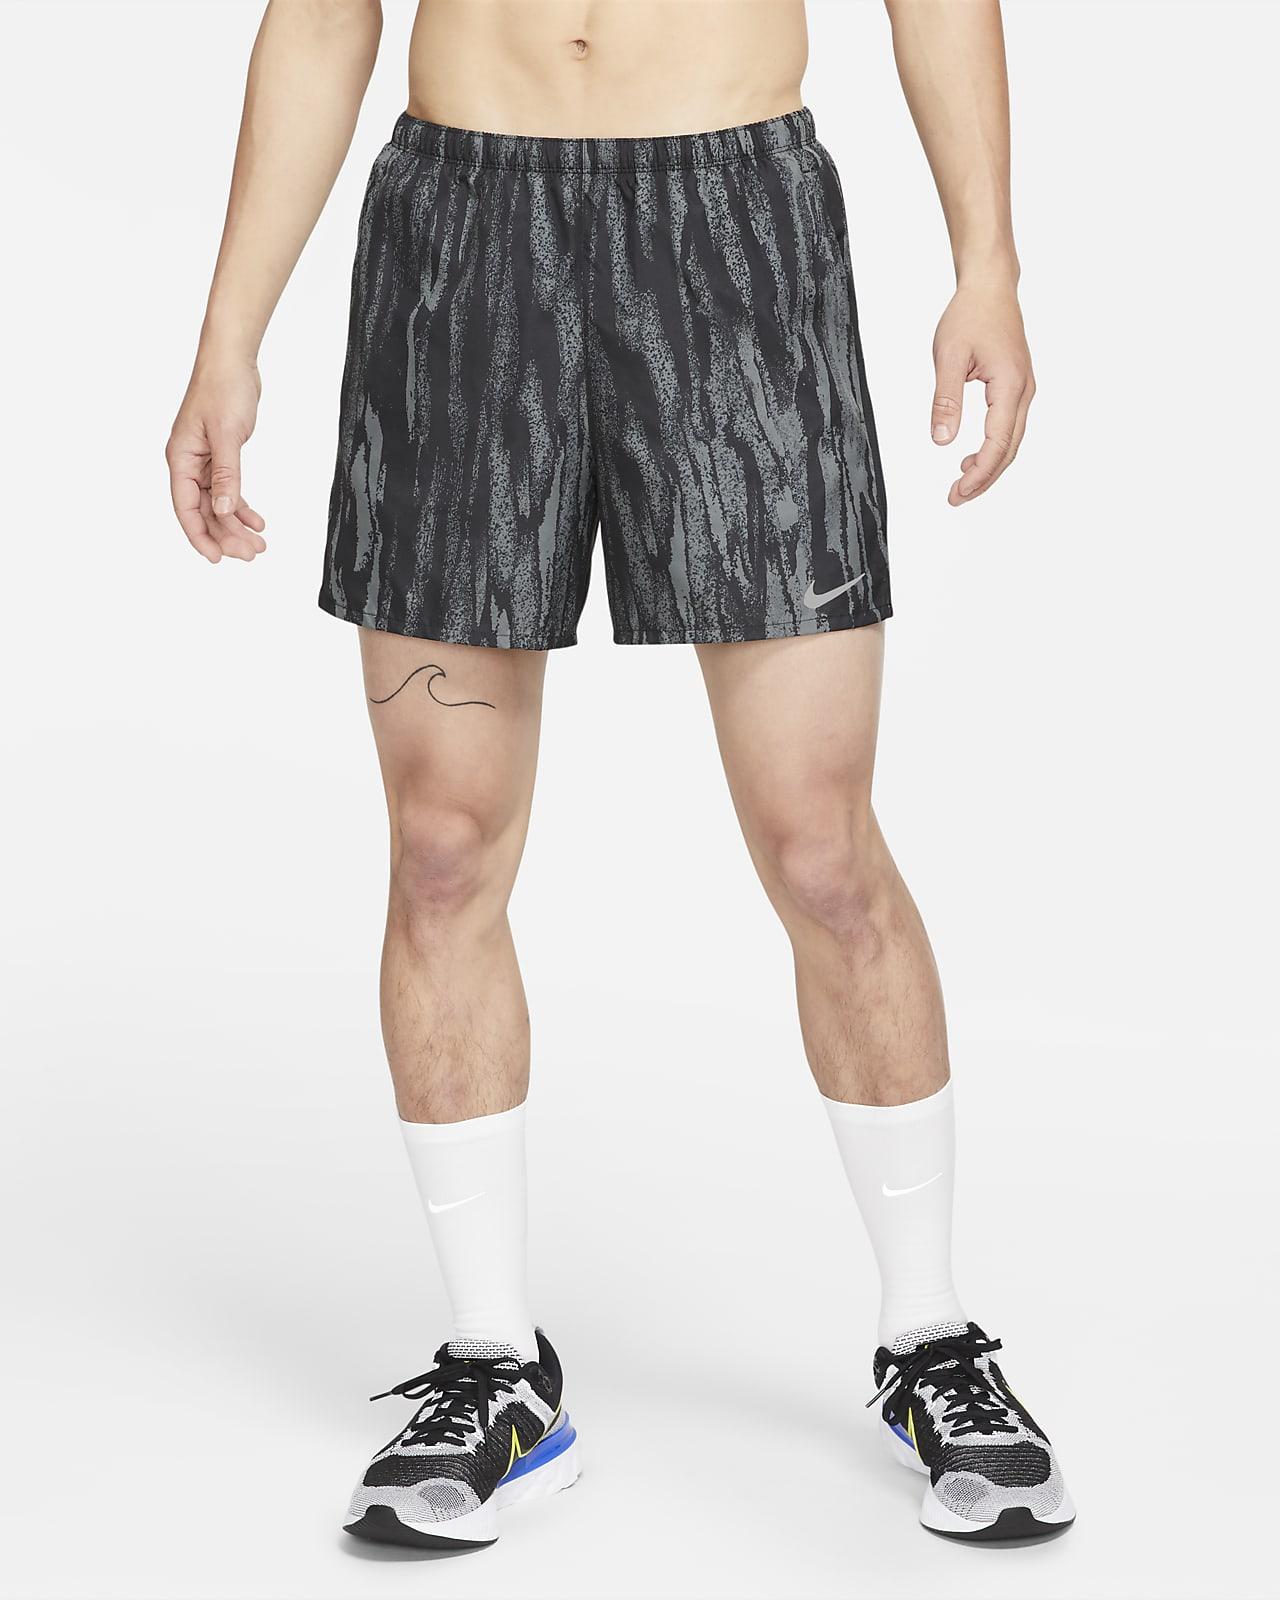 Nike Challenger Wild Run Men's 13cm (approx.) Brief-Lined Running Shorts